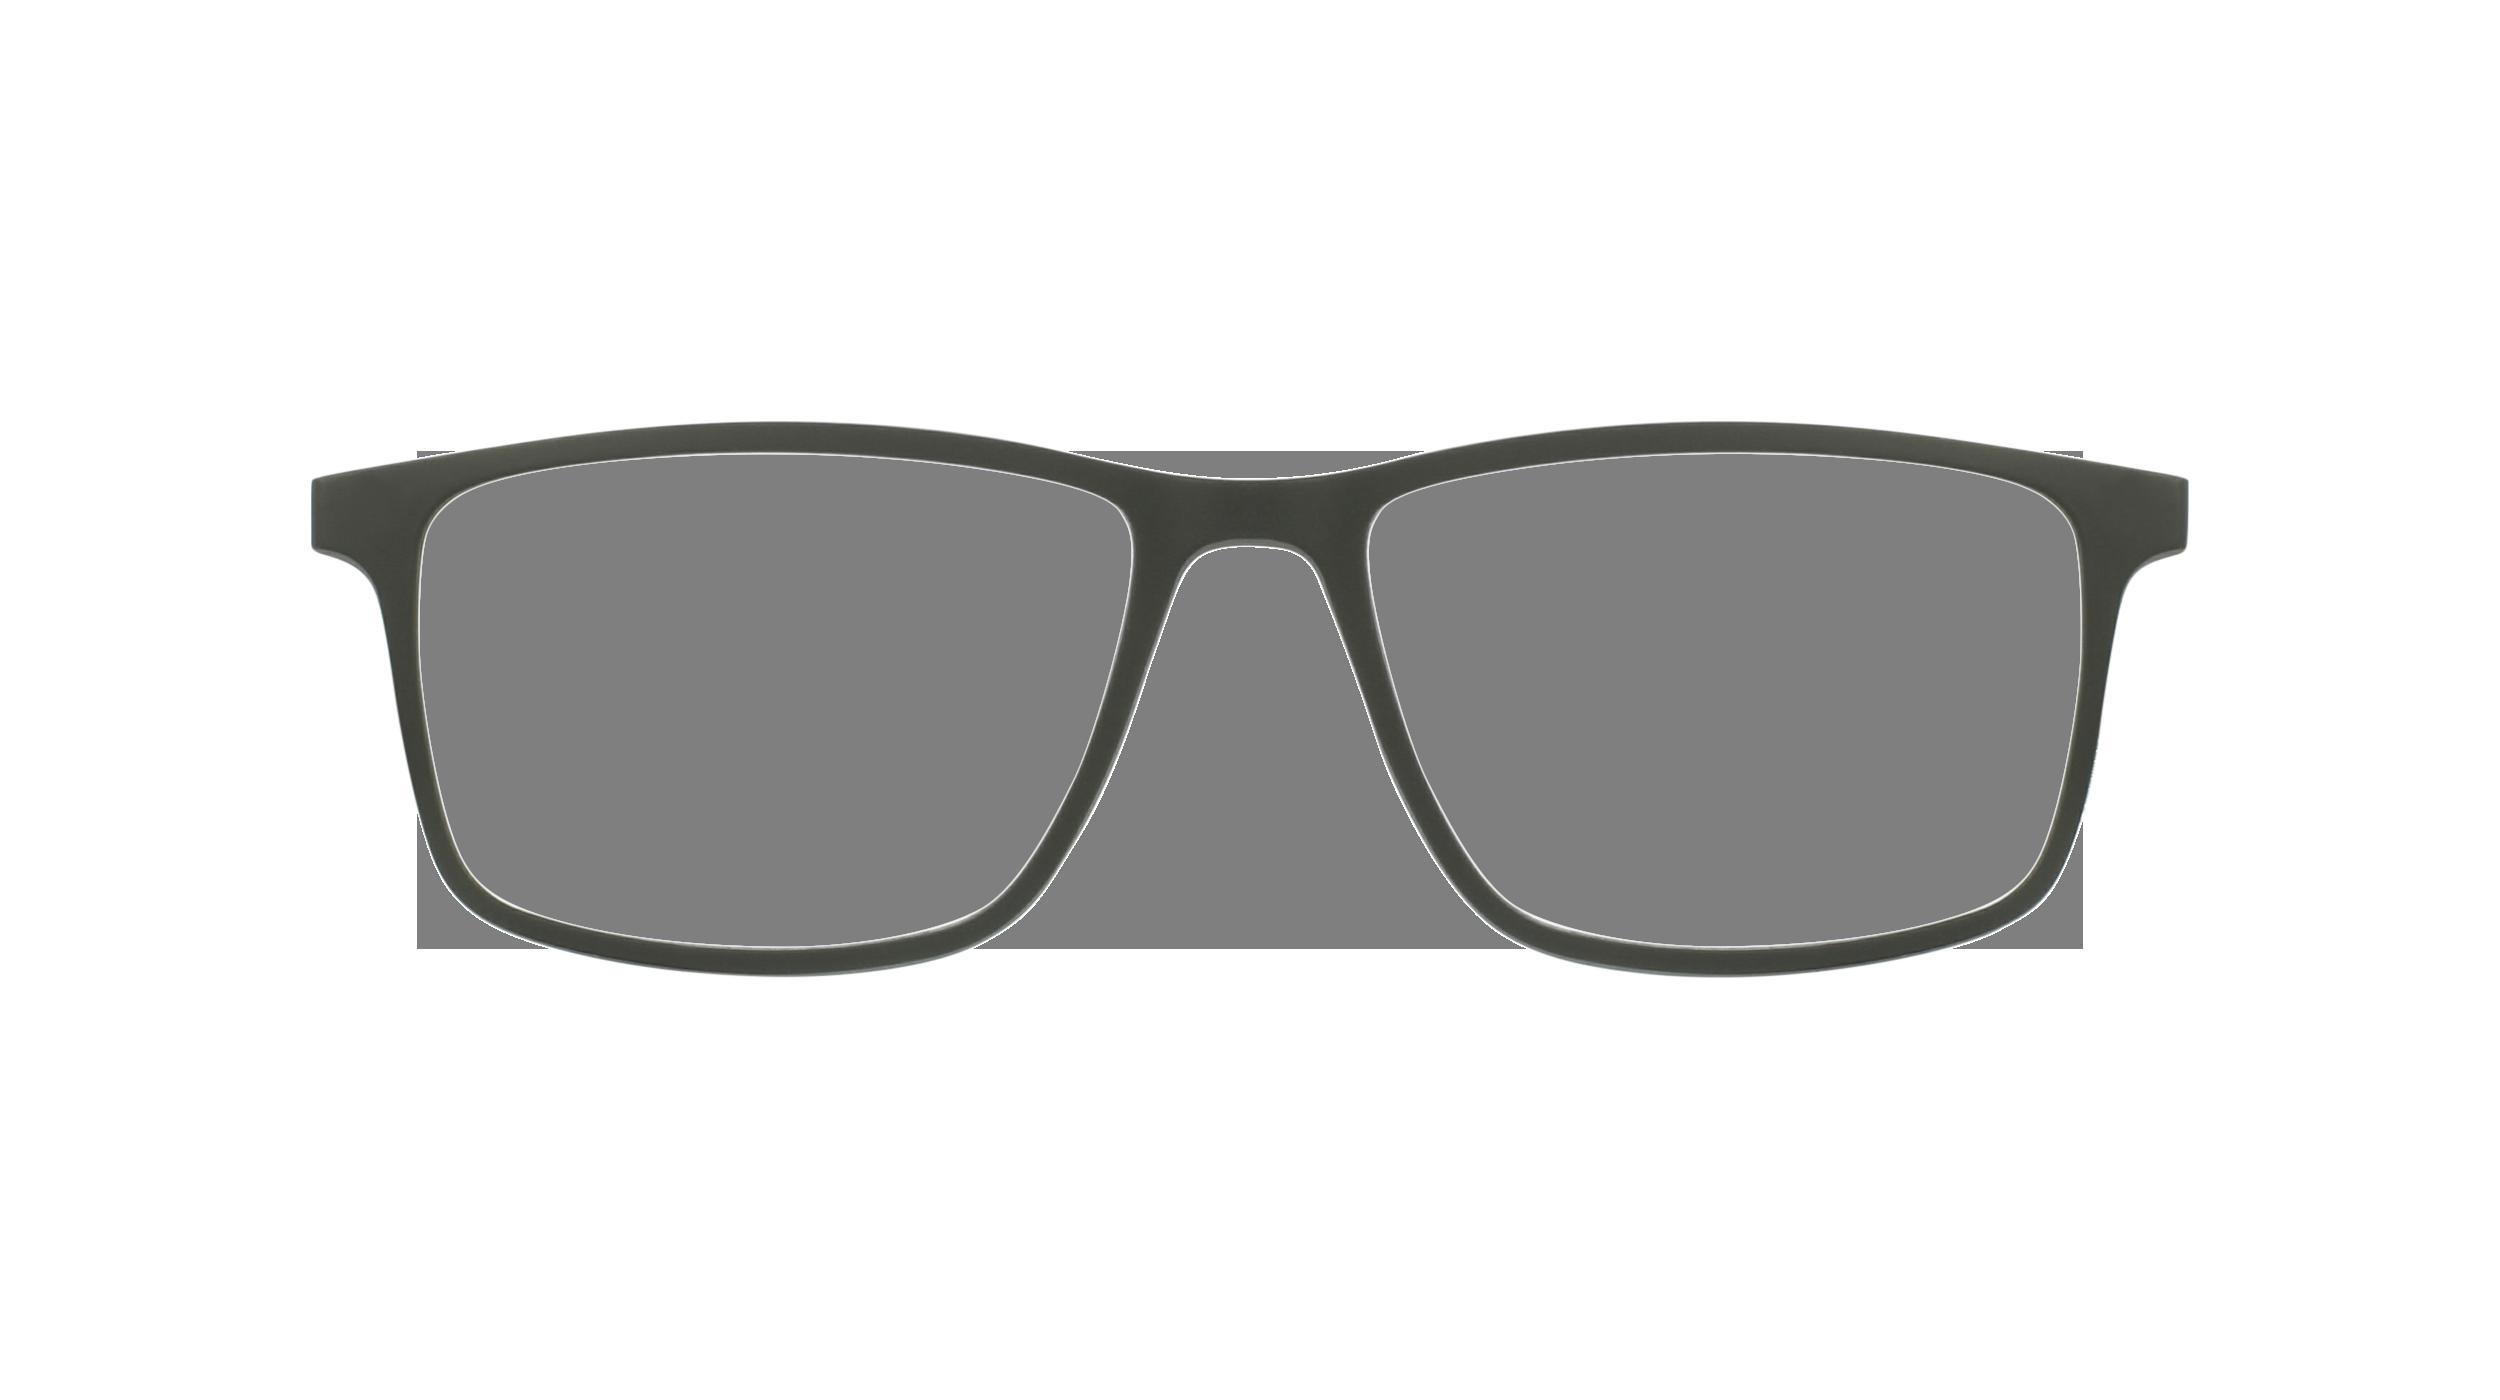 afflelou/france/products/smart_clip/clips_glasses/07630036457115.png